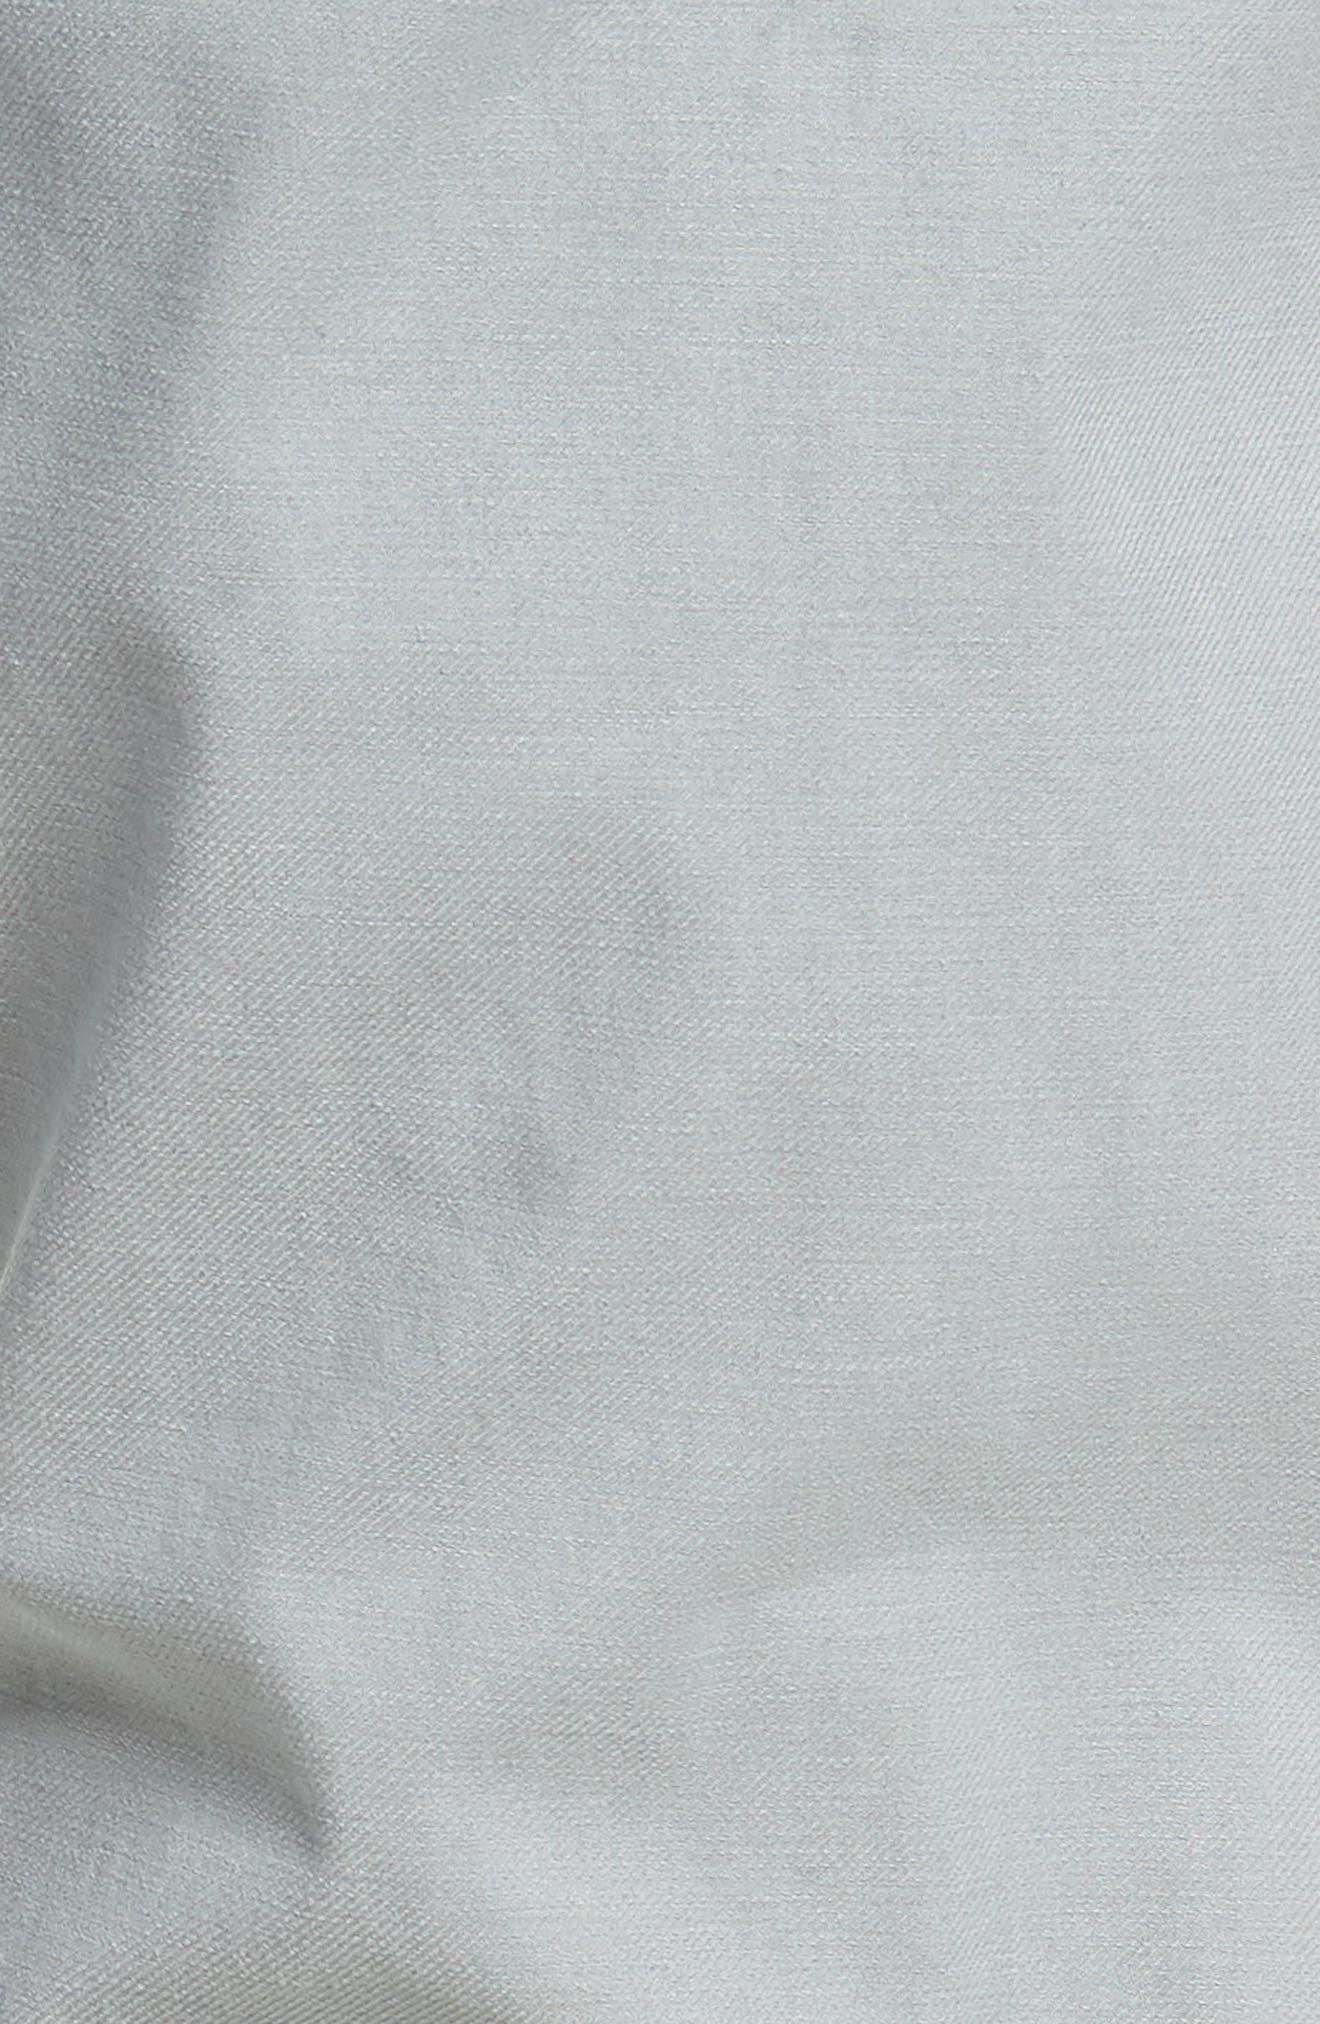 HUDSON JEANS,                             Blake Slim Fit Jeans,                             Alternate thumbnail 5, color,                             400